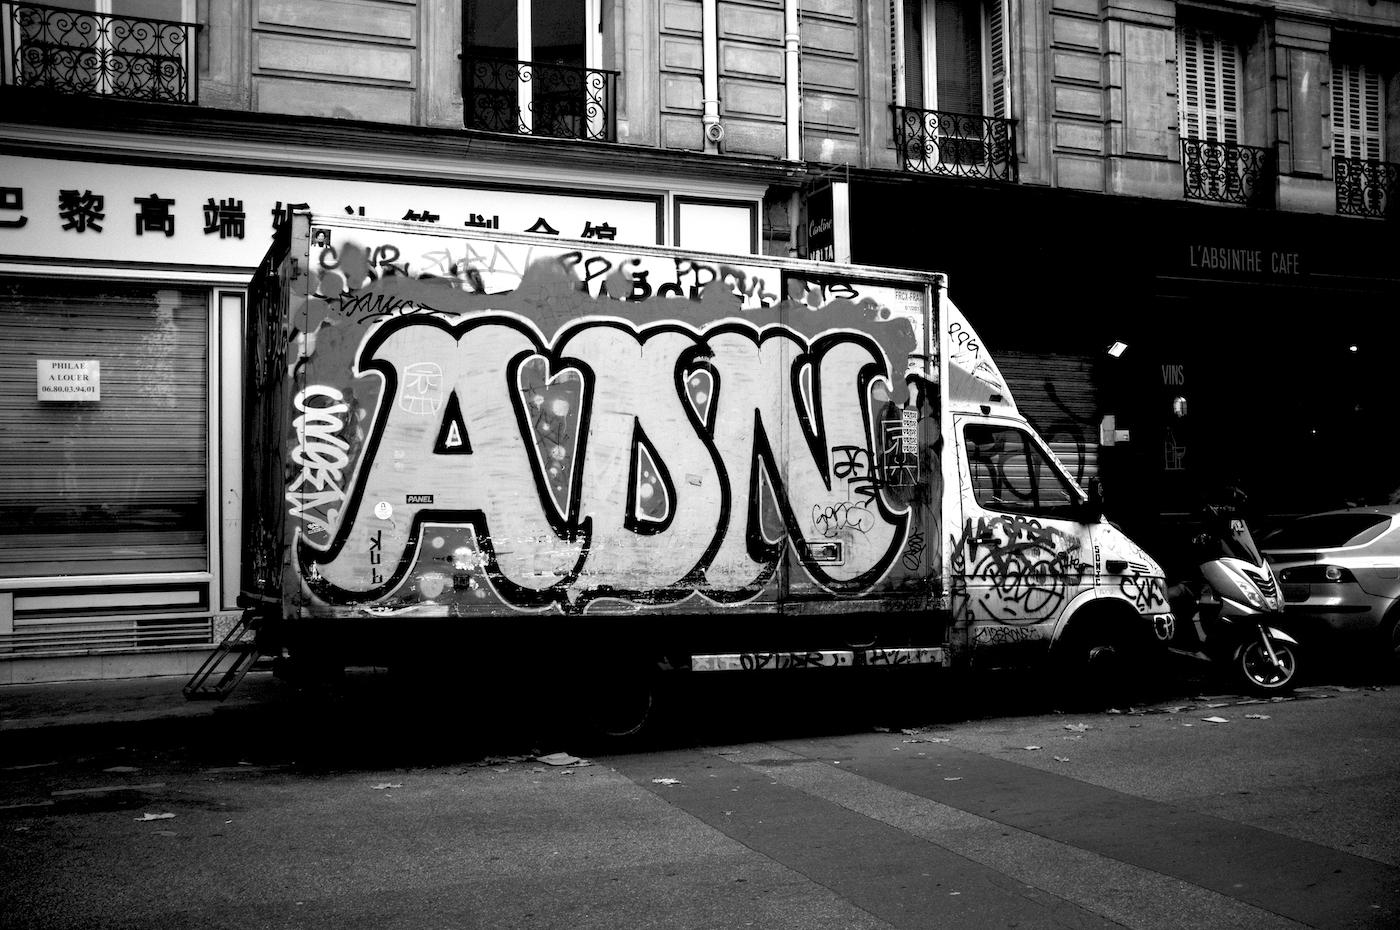 161126-marcvallee-Graffiti-Trucks-26.11.16.0042